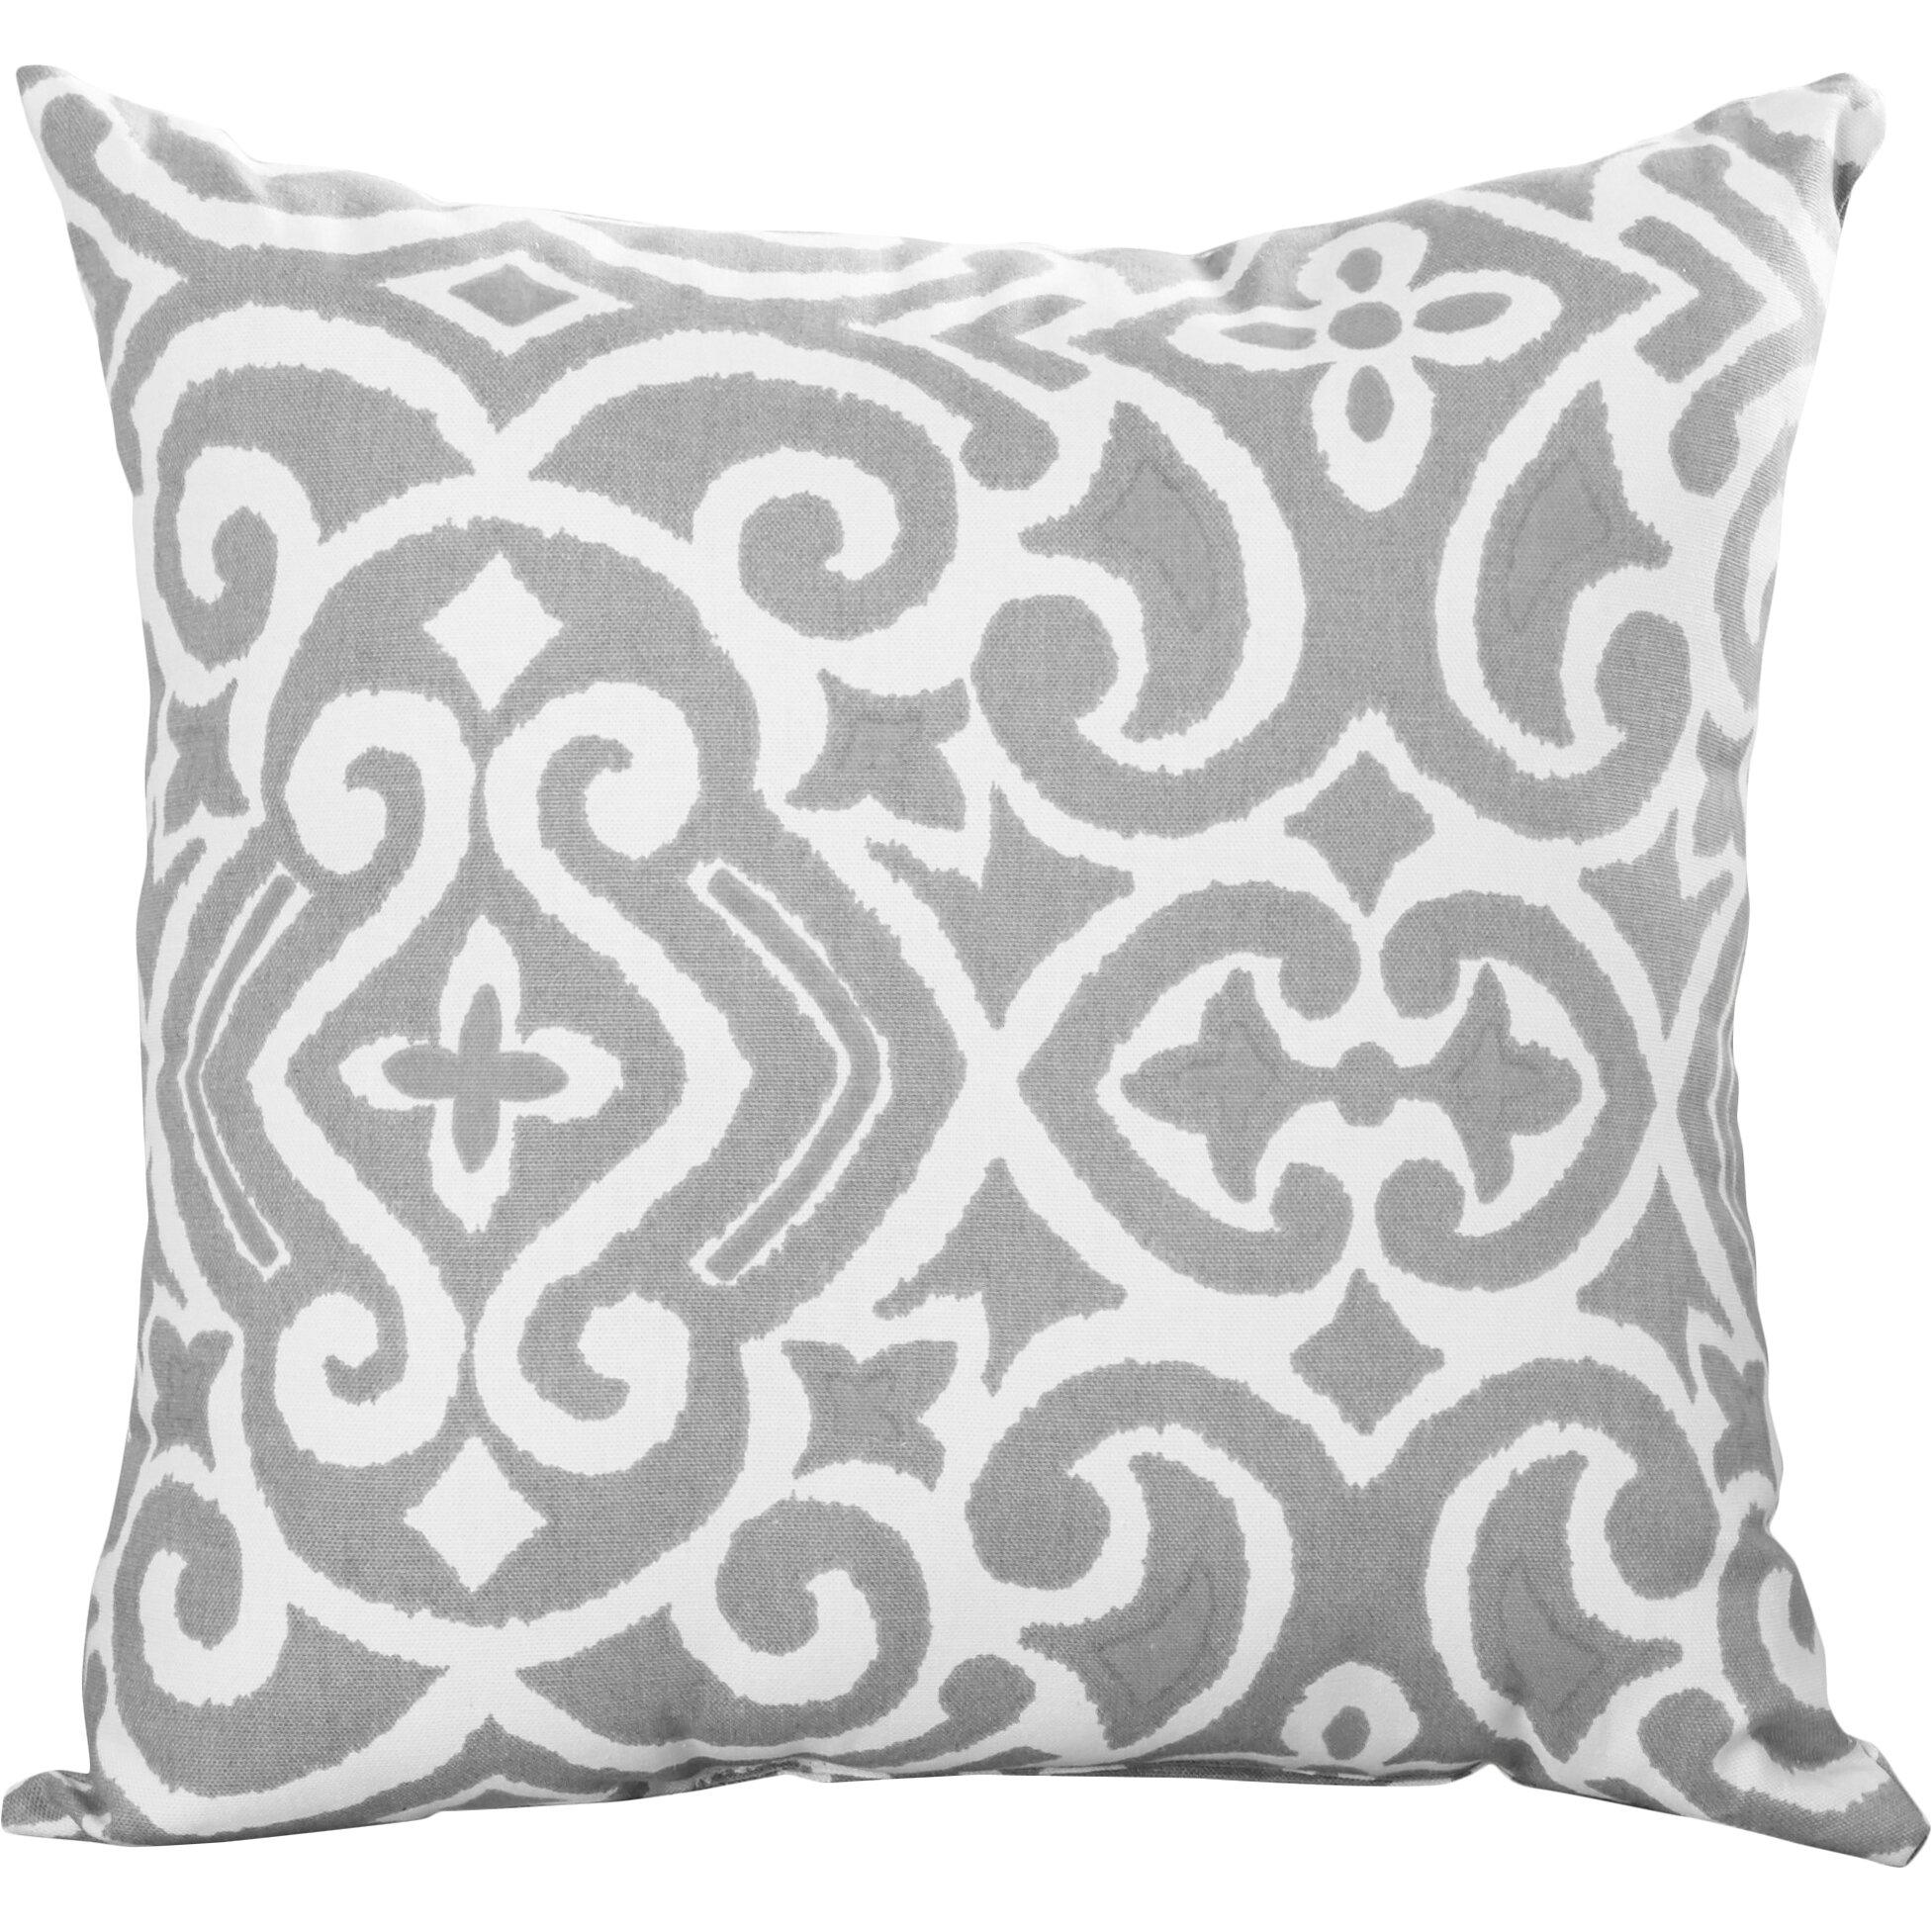 Brown and teal throw pillows - Andover Mills Reg Ansonia Damask Throw Pillow